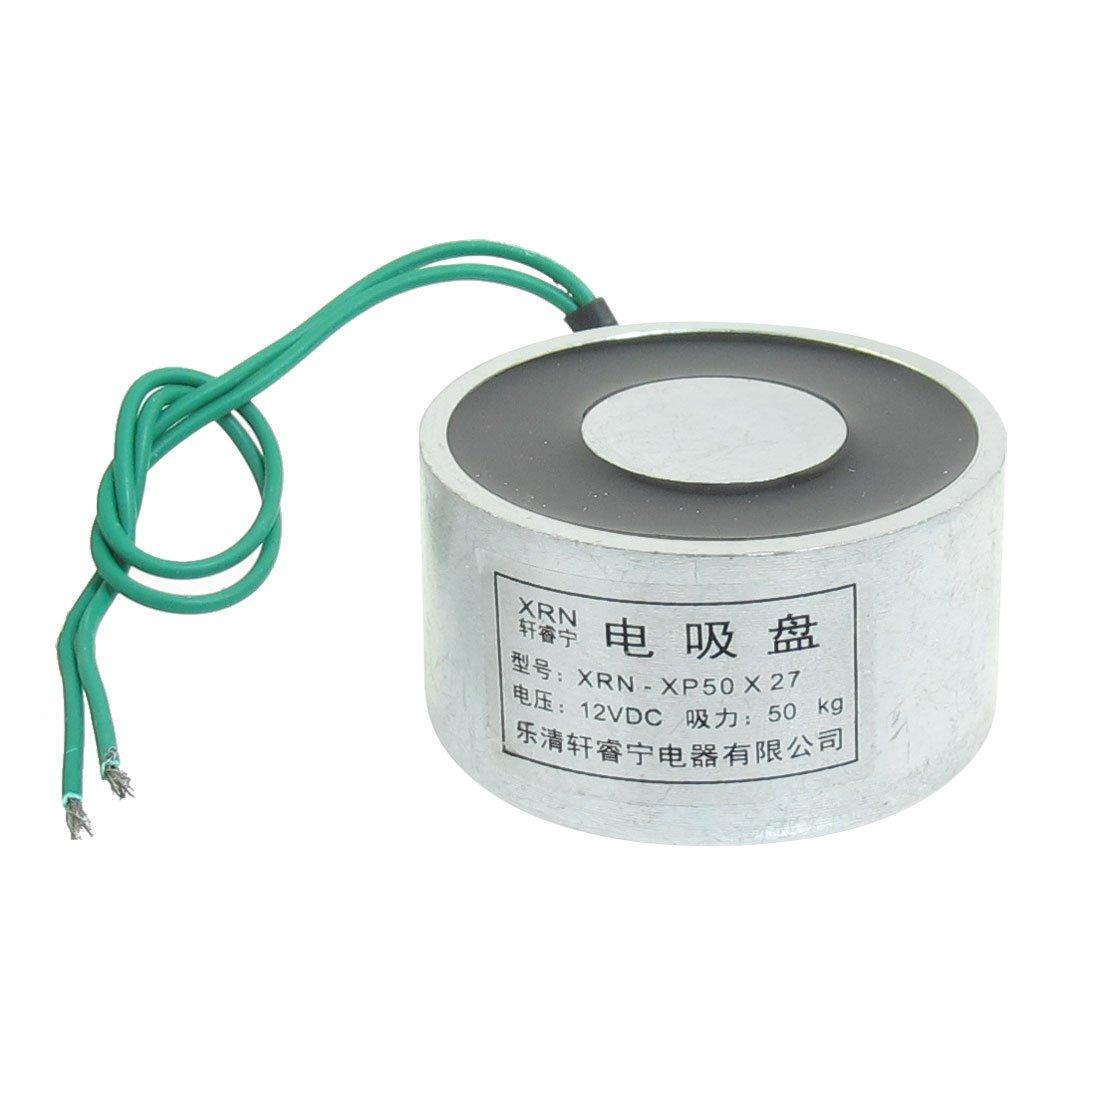 Sourcingmap a13032500ux0520 - Aspirado imá n elevador electroimá n 12 vcc 50 kg 110 libras 50x27mm elé ctrica